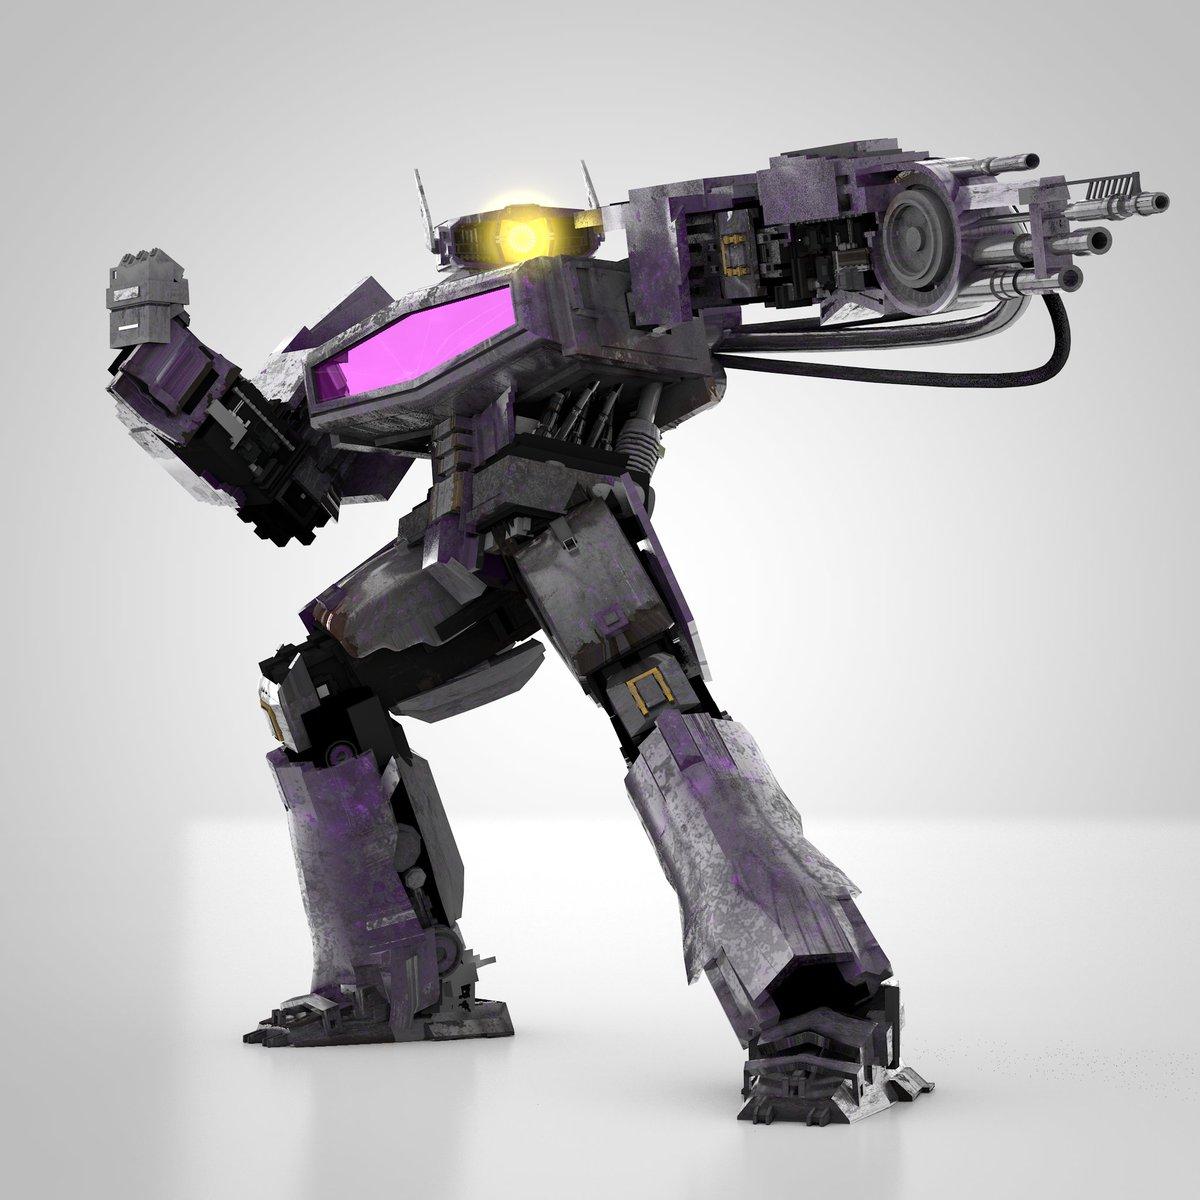 Shockwave version 2021 (probabily the last version). #optimusprime #transformers #autobots #bumblebeemovie #cinema4d #3dmodel #megatron #decepticons